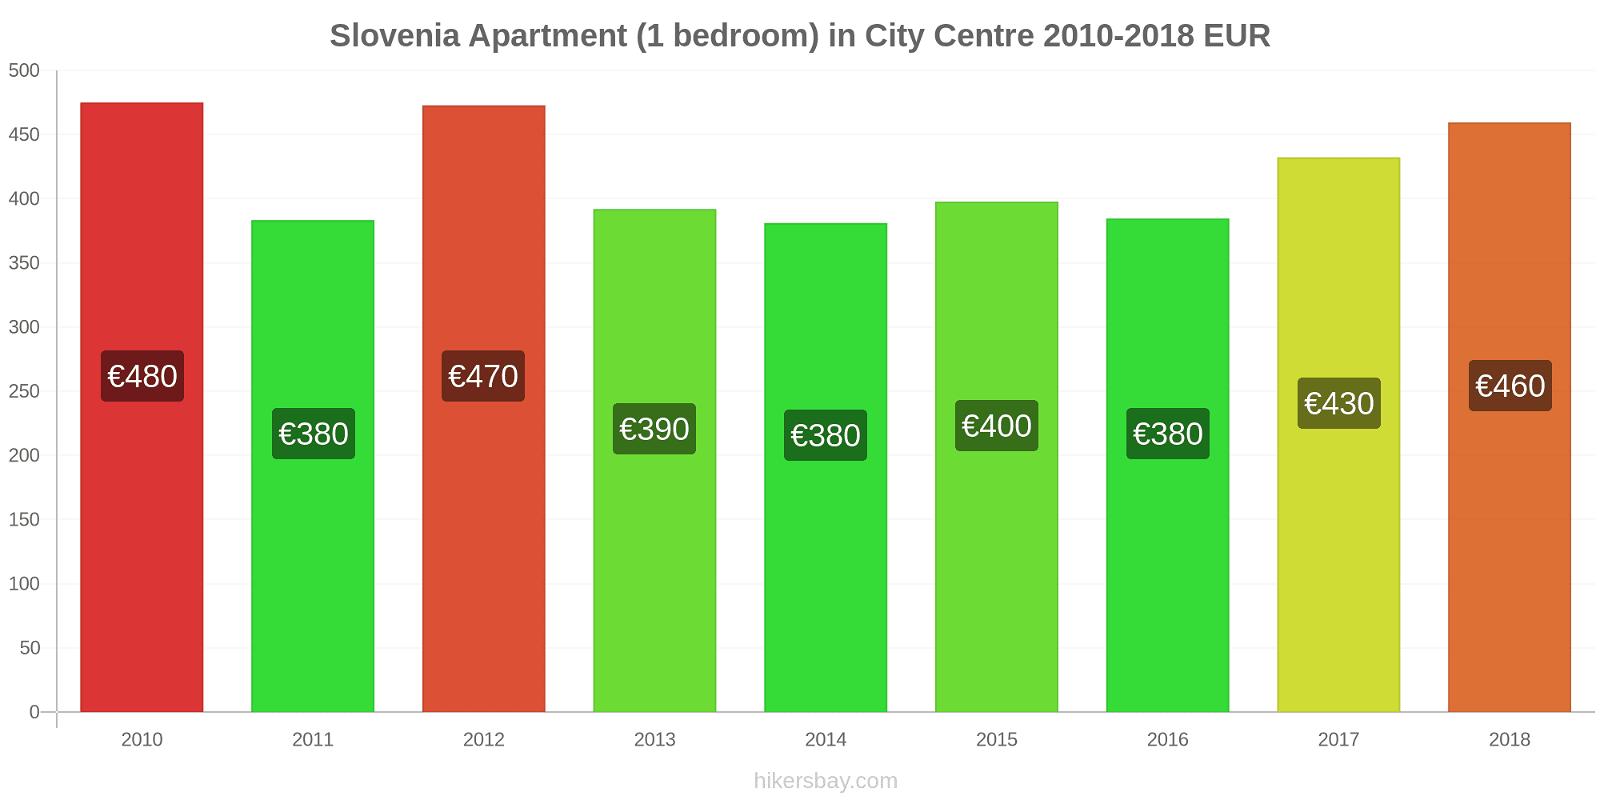 Slovenia price changes Apartment (1 bedroom) in City Centre hikersbay.com